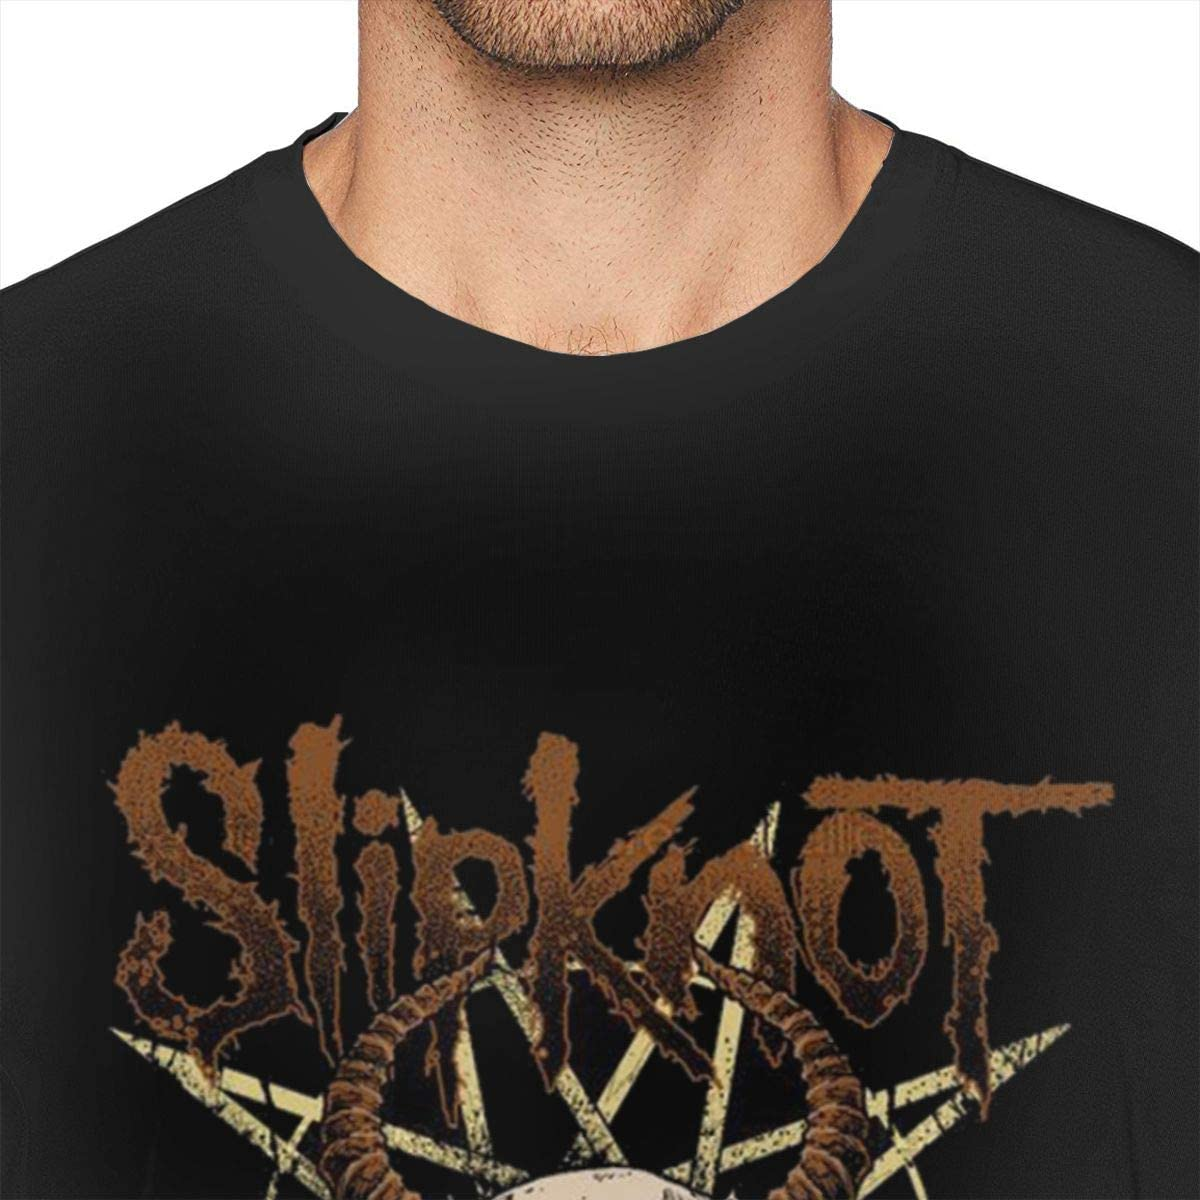 Livetees Slipknot Hombres Comfort Camiseta Black M: Amazon.es ...